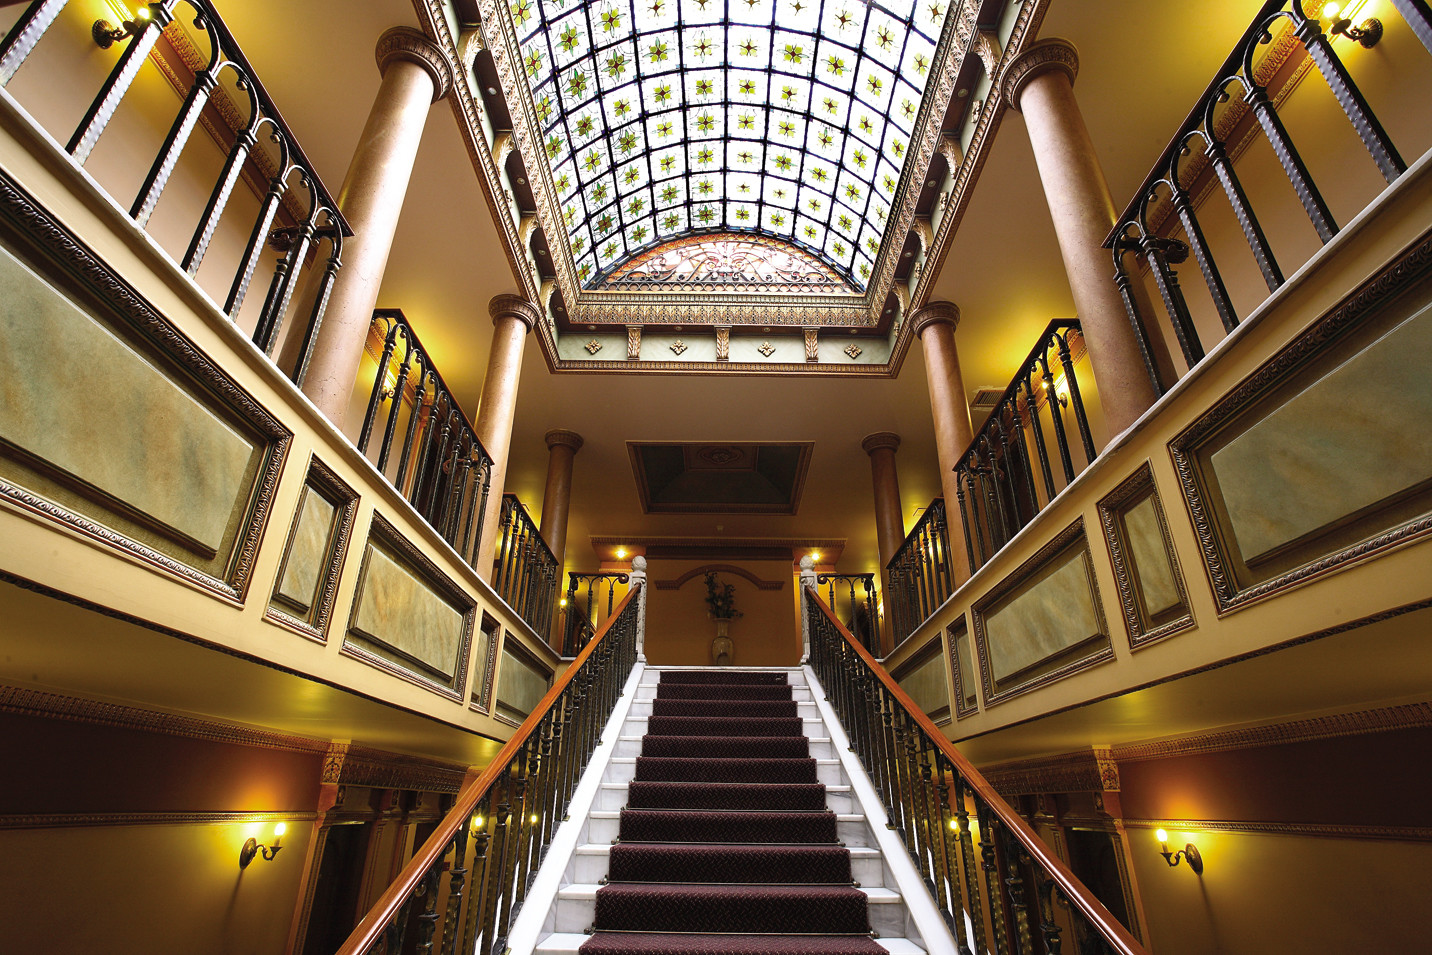 Otel Sultan Sarayı Tanıtım Filmi